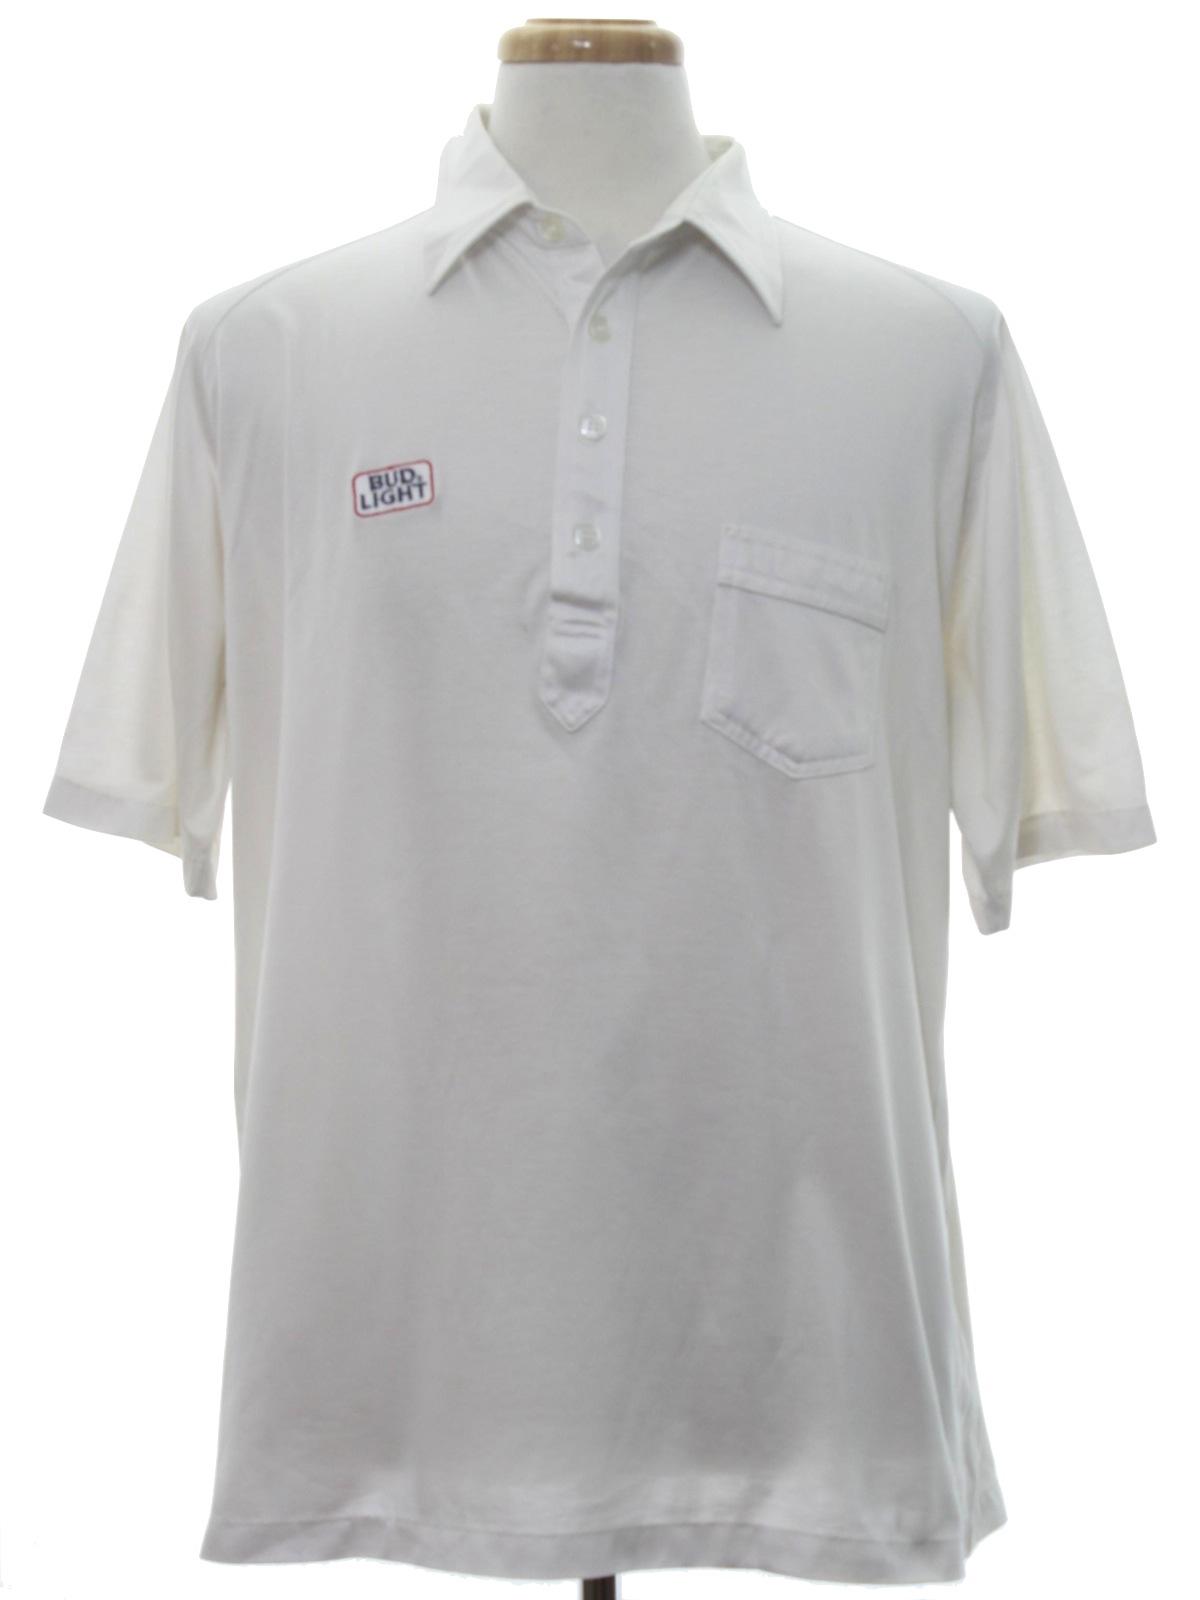 Retro Eighties Shirt 80s Sahara Mens White With Red And